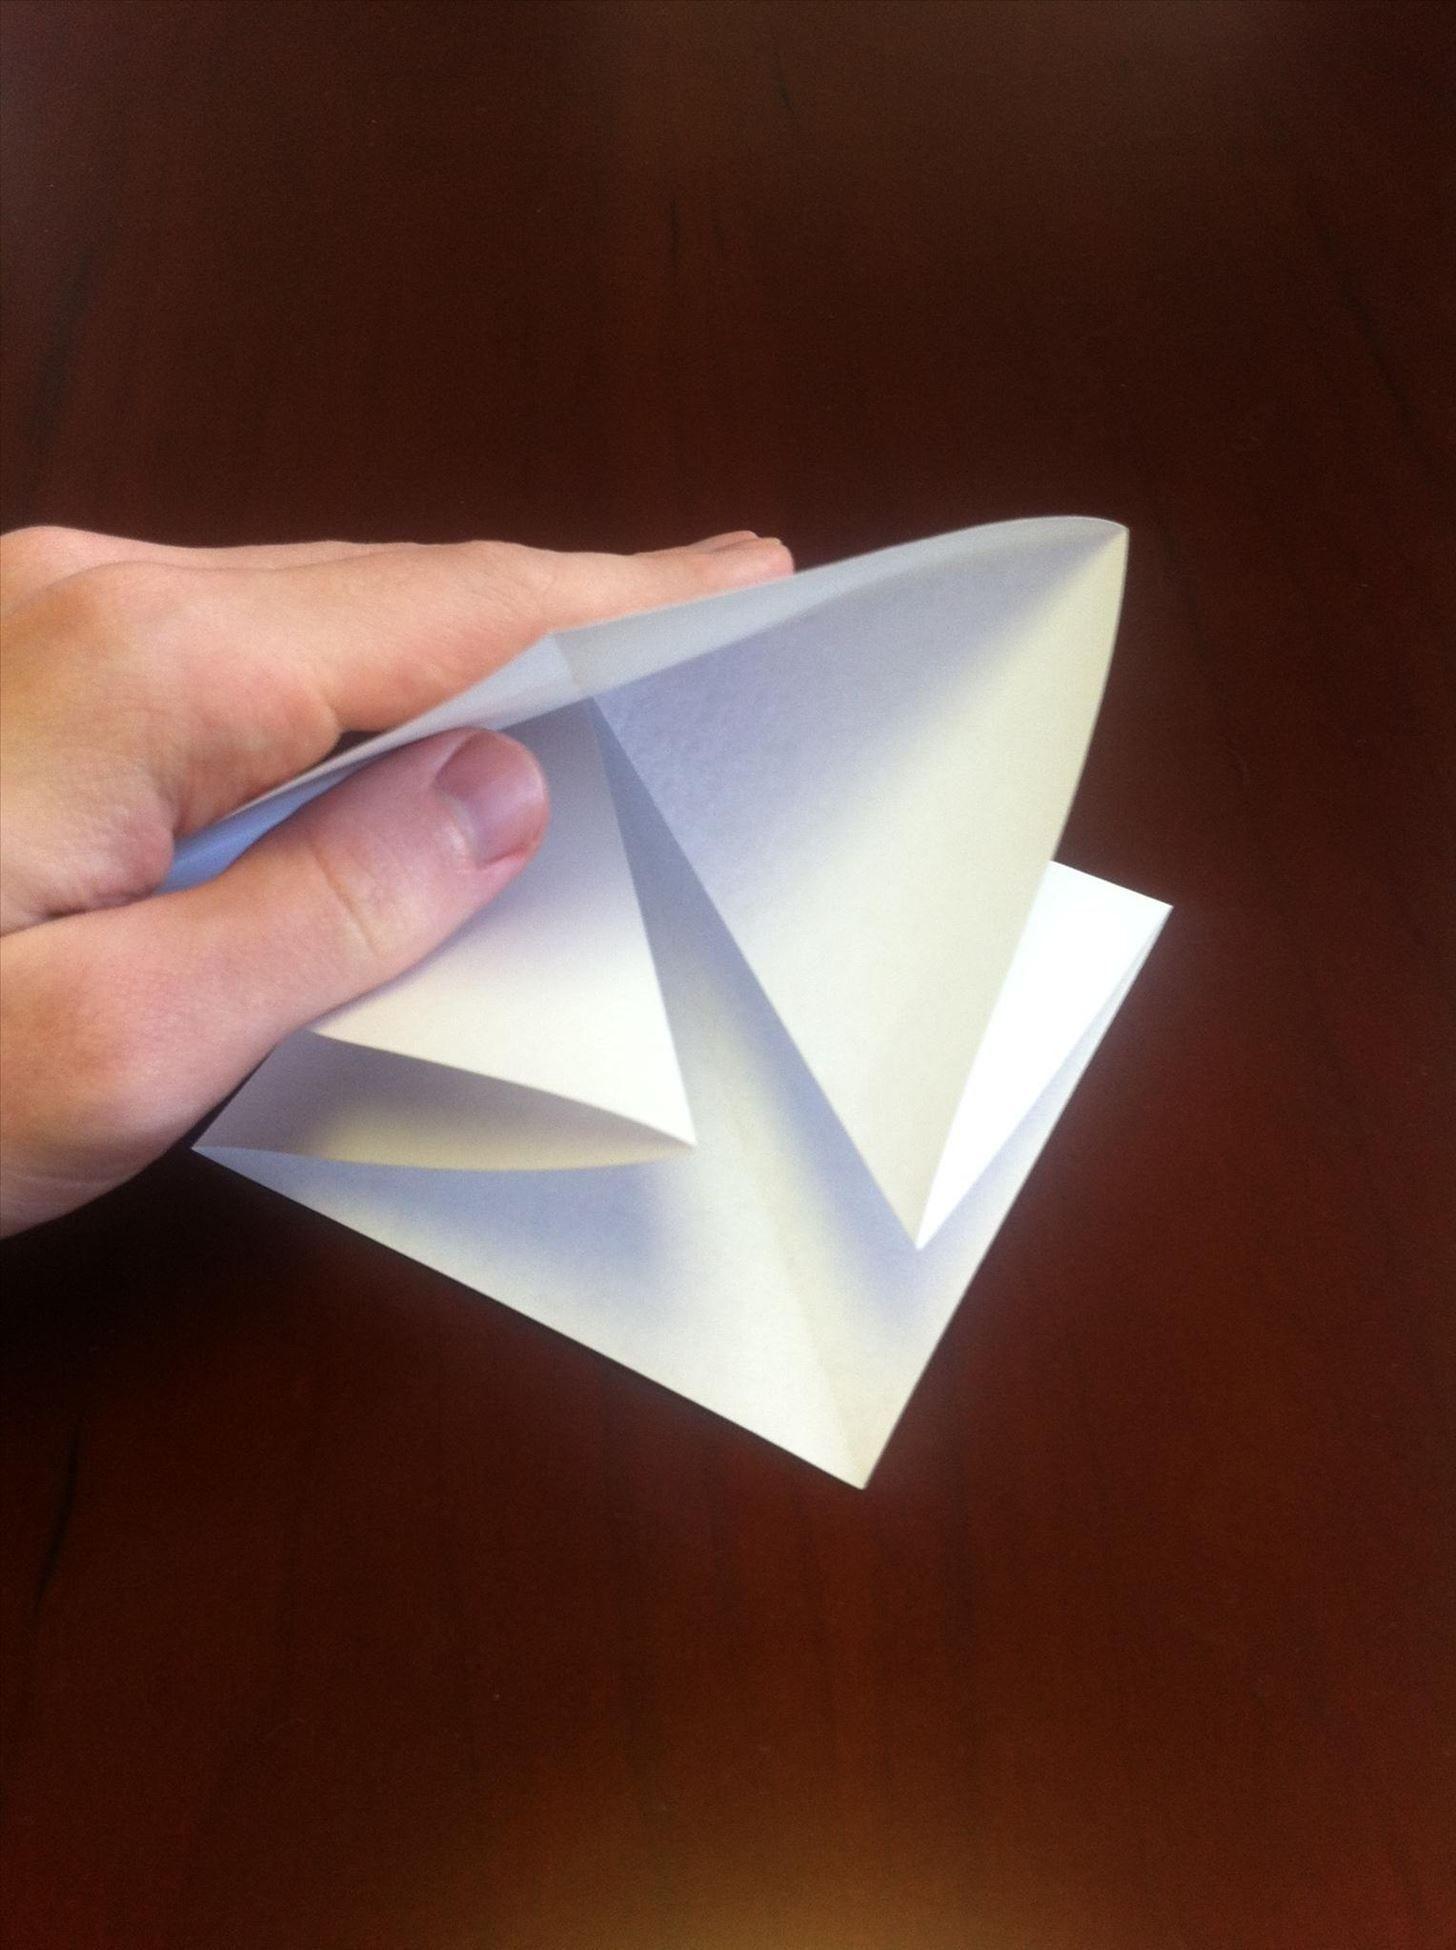 Snake Dragon - Origami Diagrams | 1950x1456